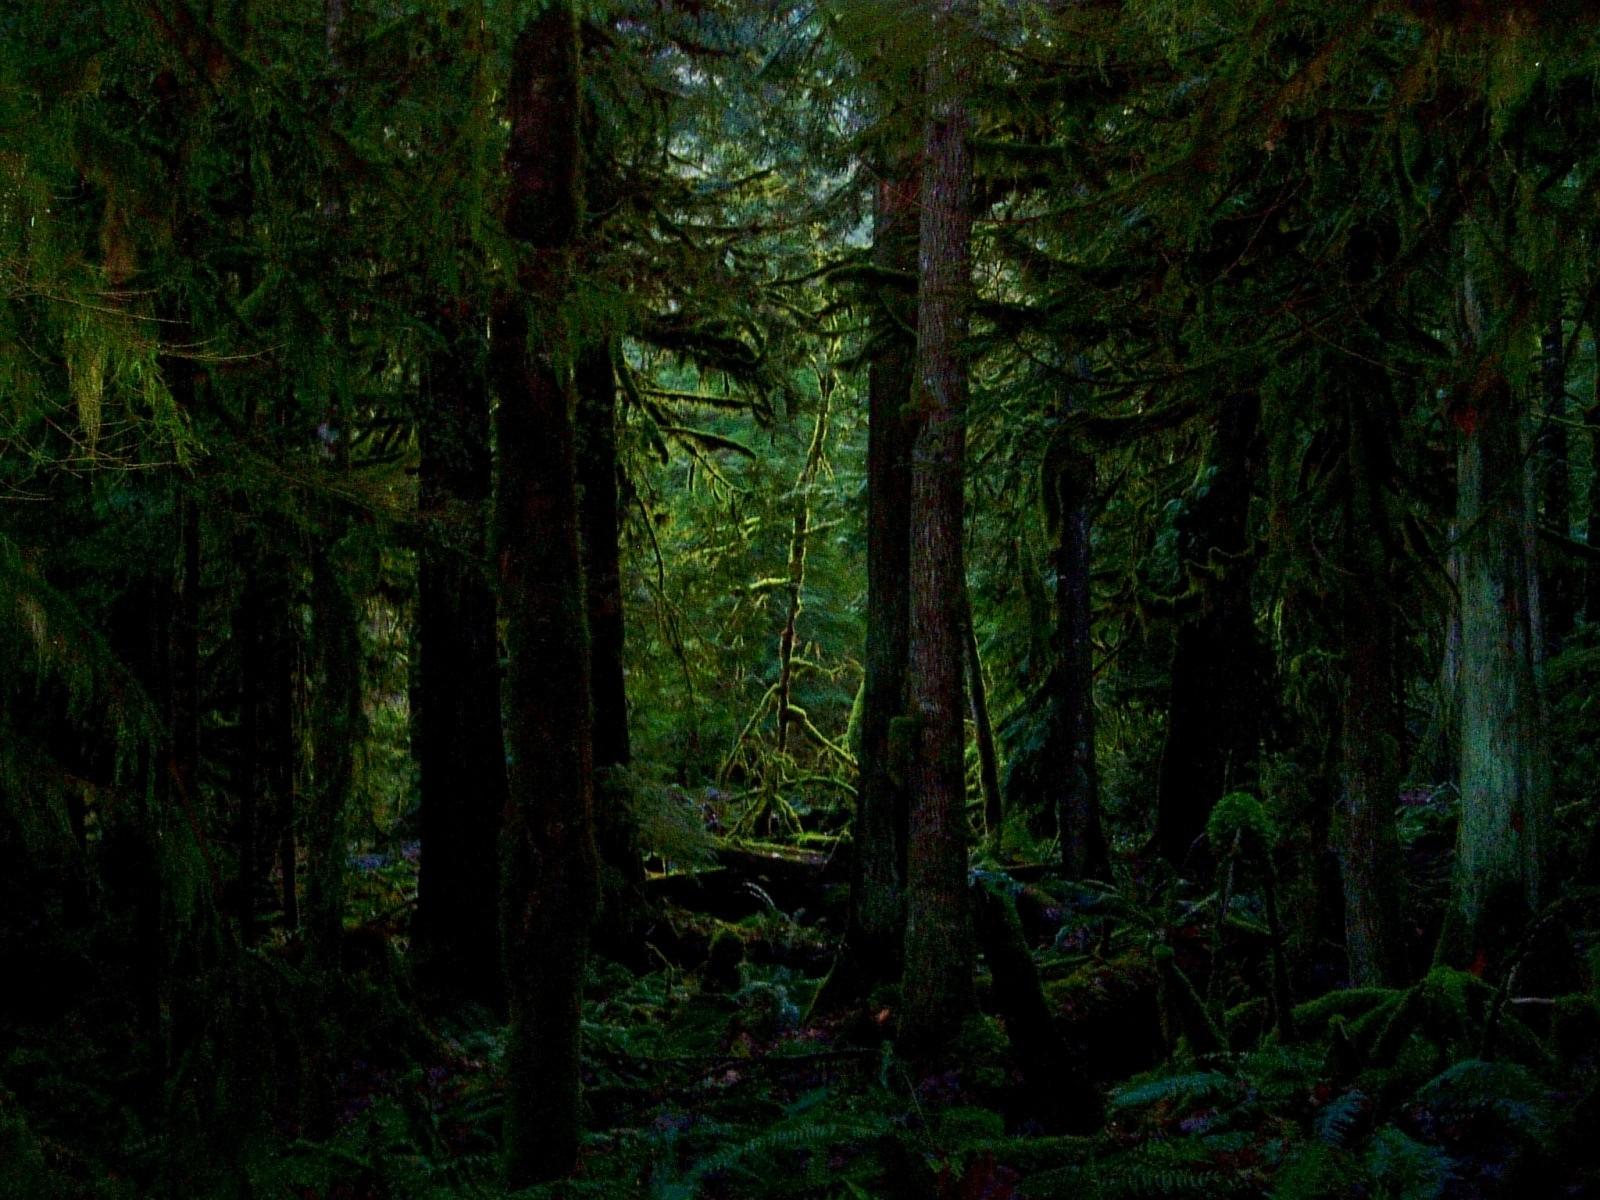 National Park clipart dark forest #2